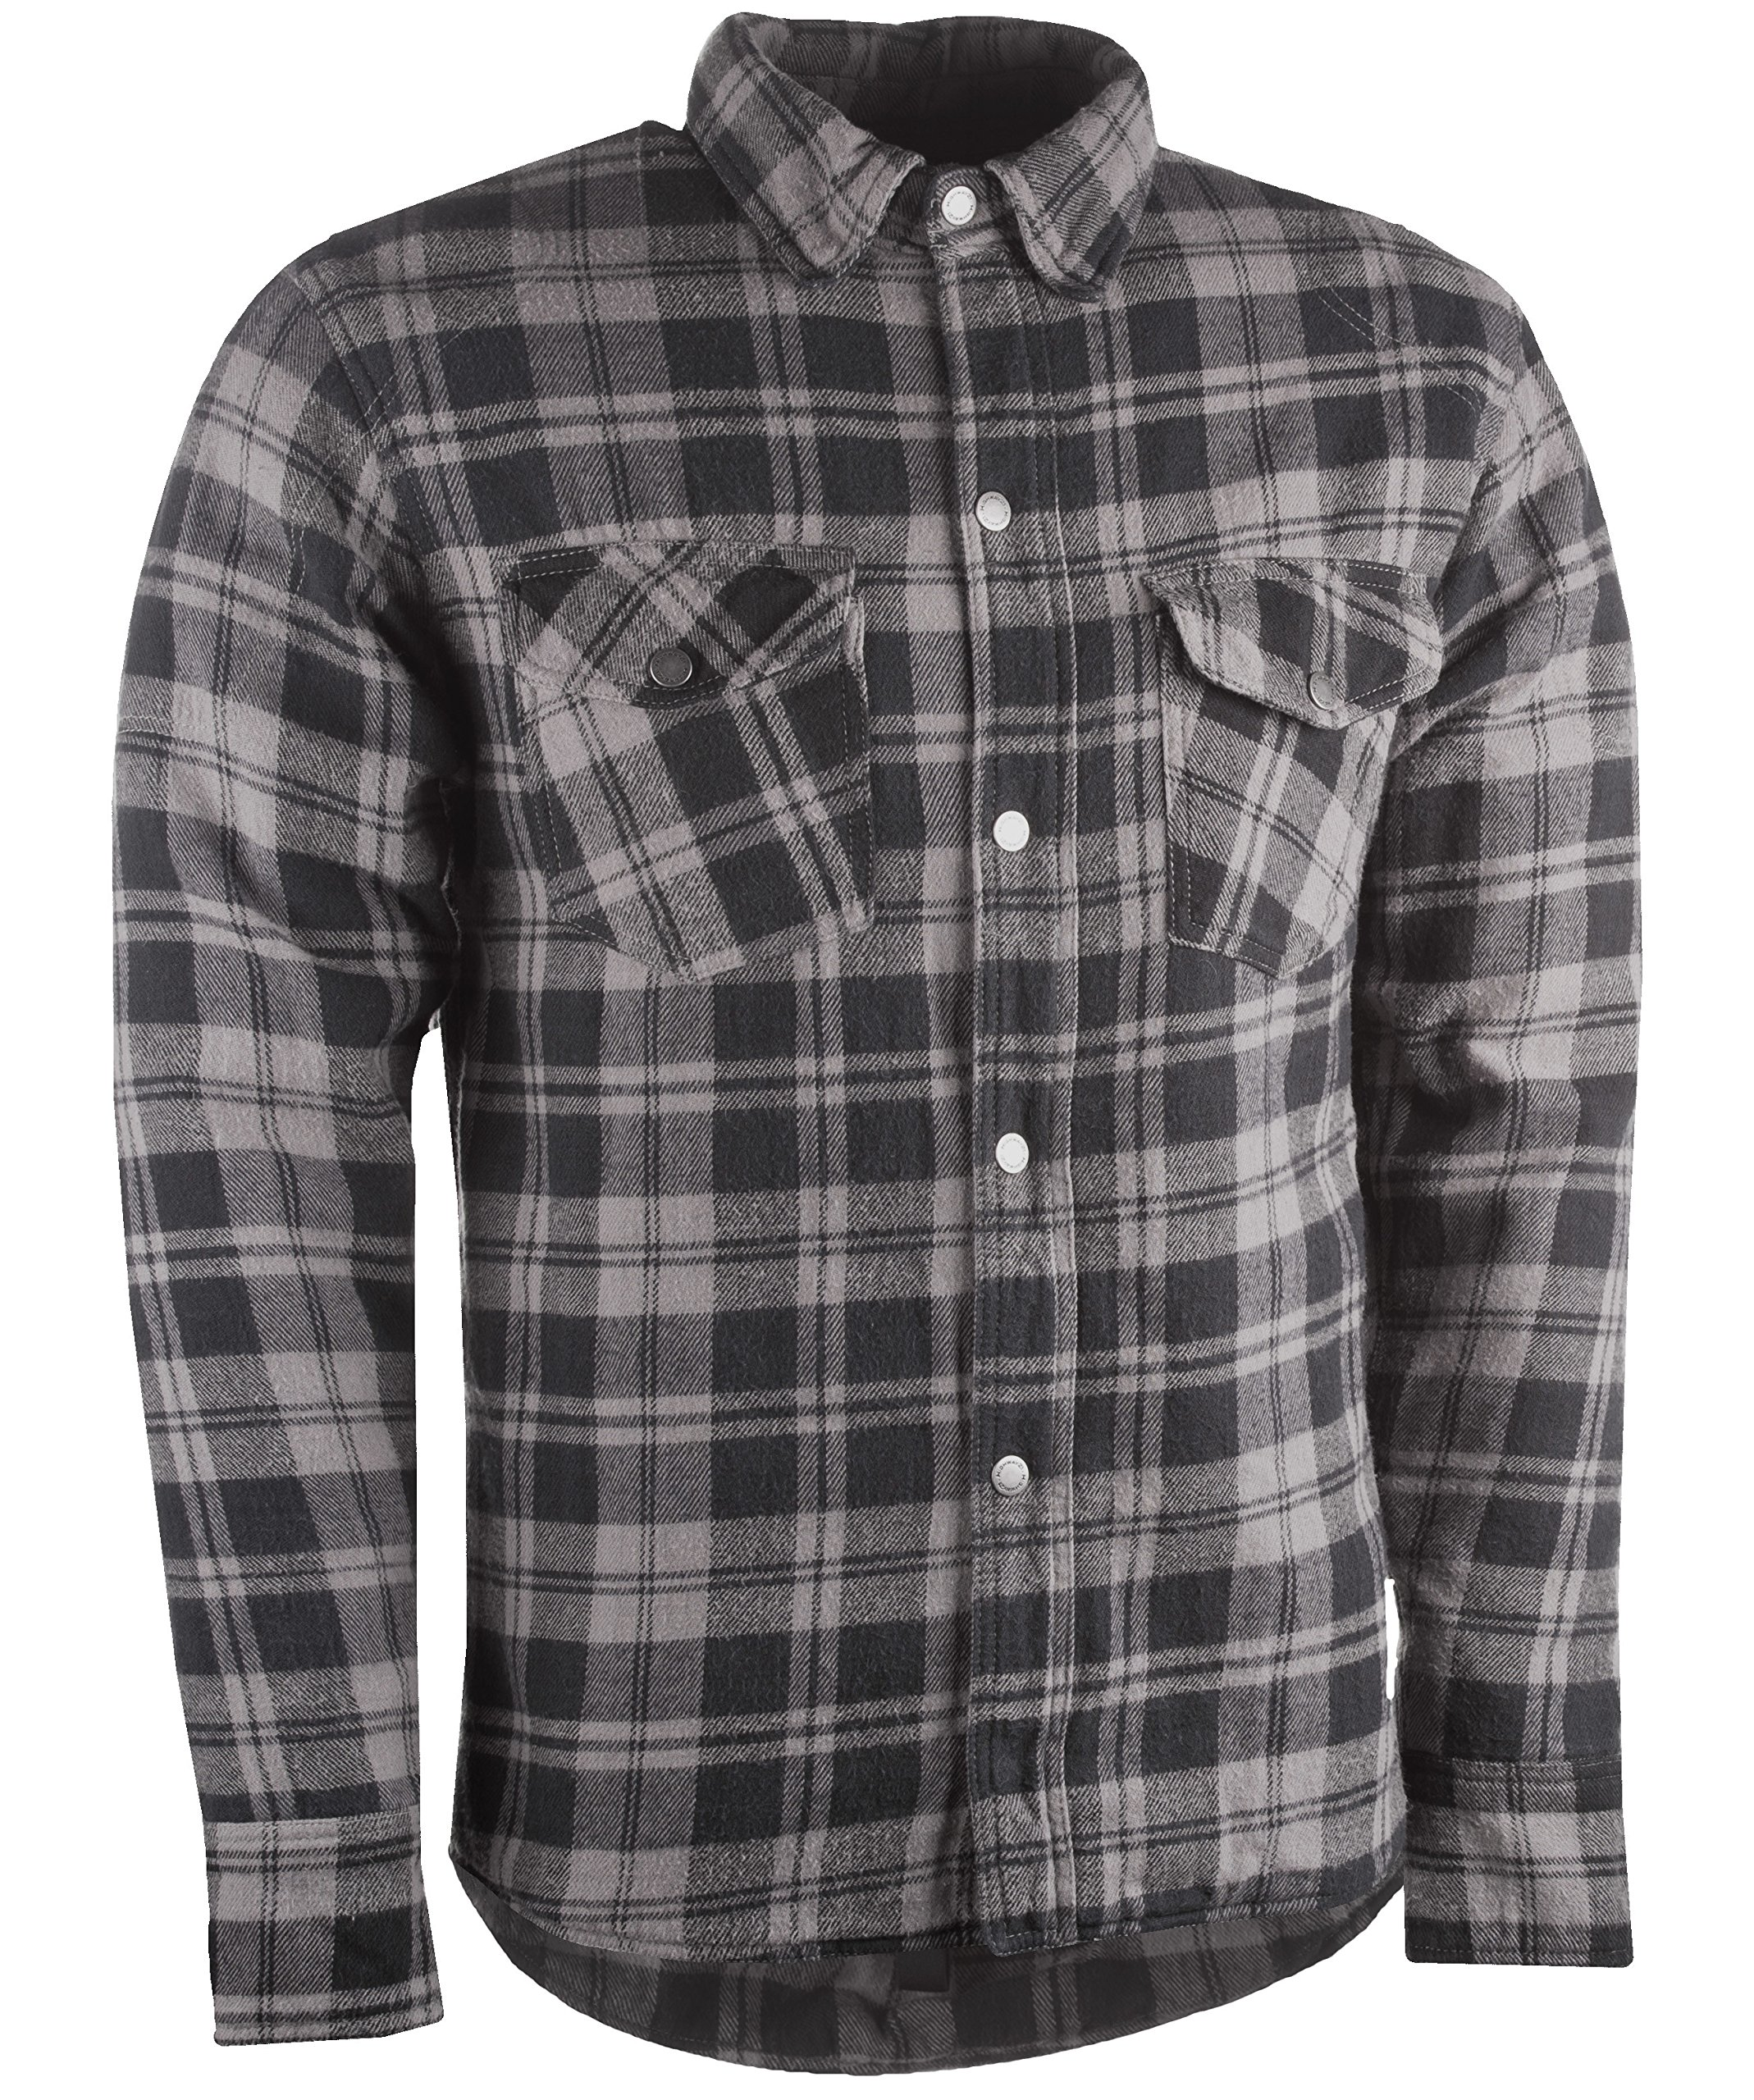 Highway 21 Marksman Men's Motorcycle Long Sleeve Flannel Shirt W/CE Armors/PE Back Armor Black/Grey Size Large